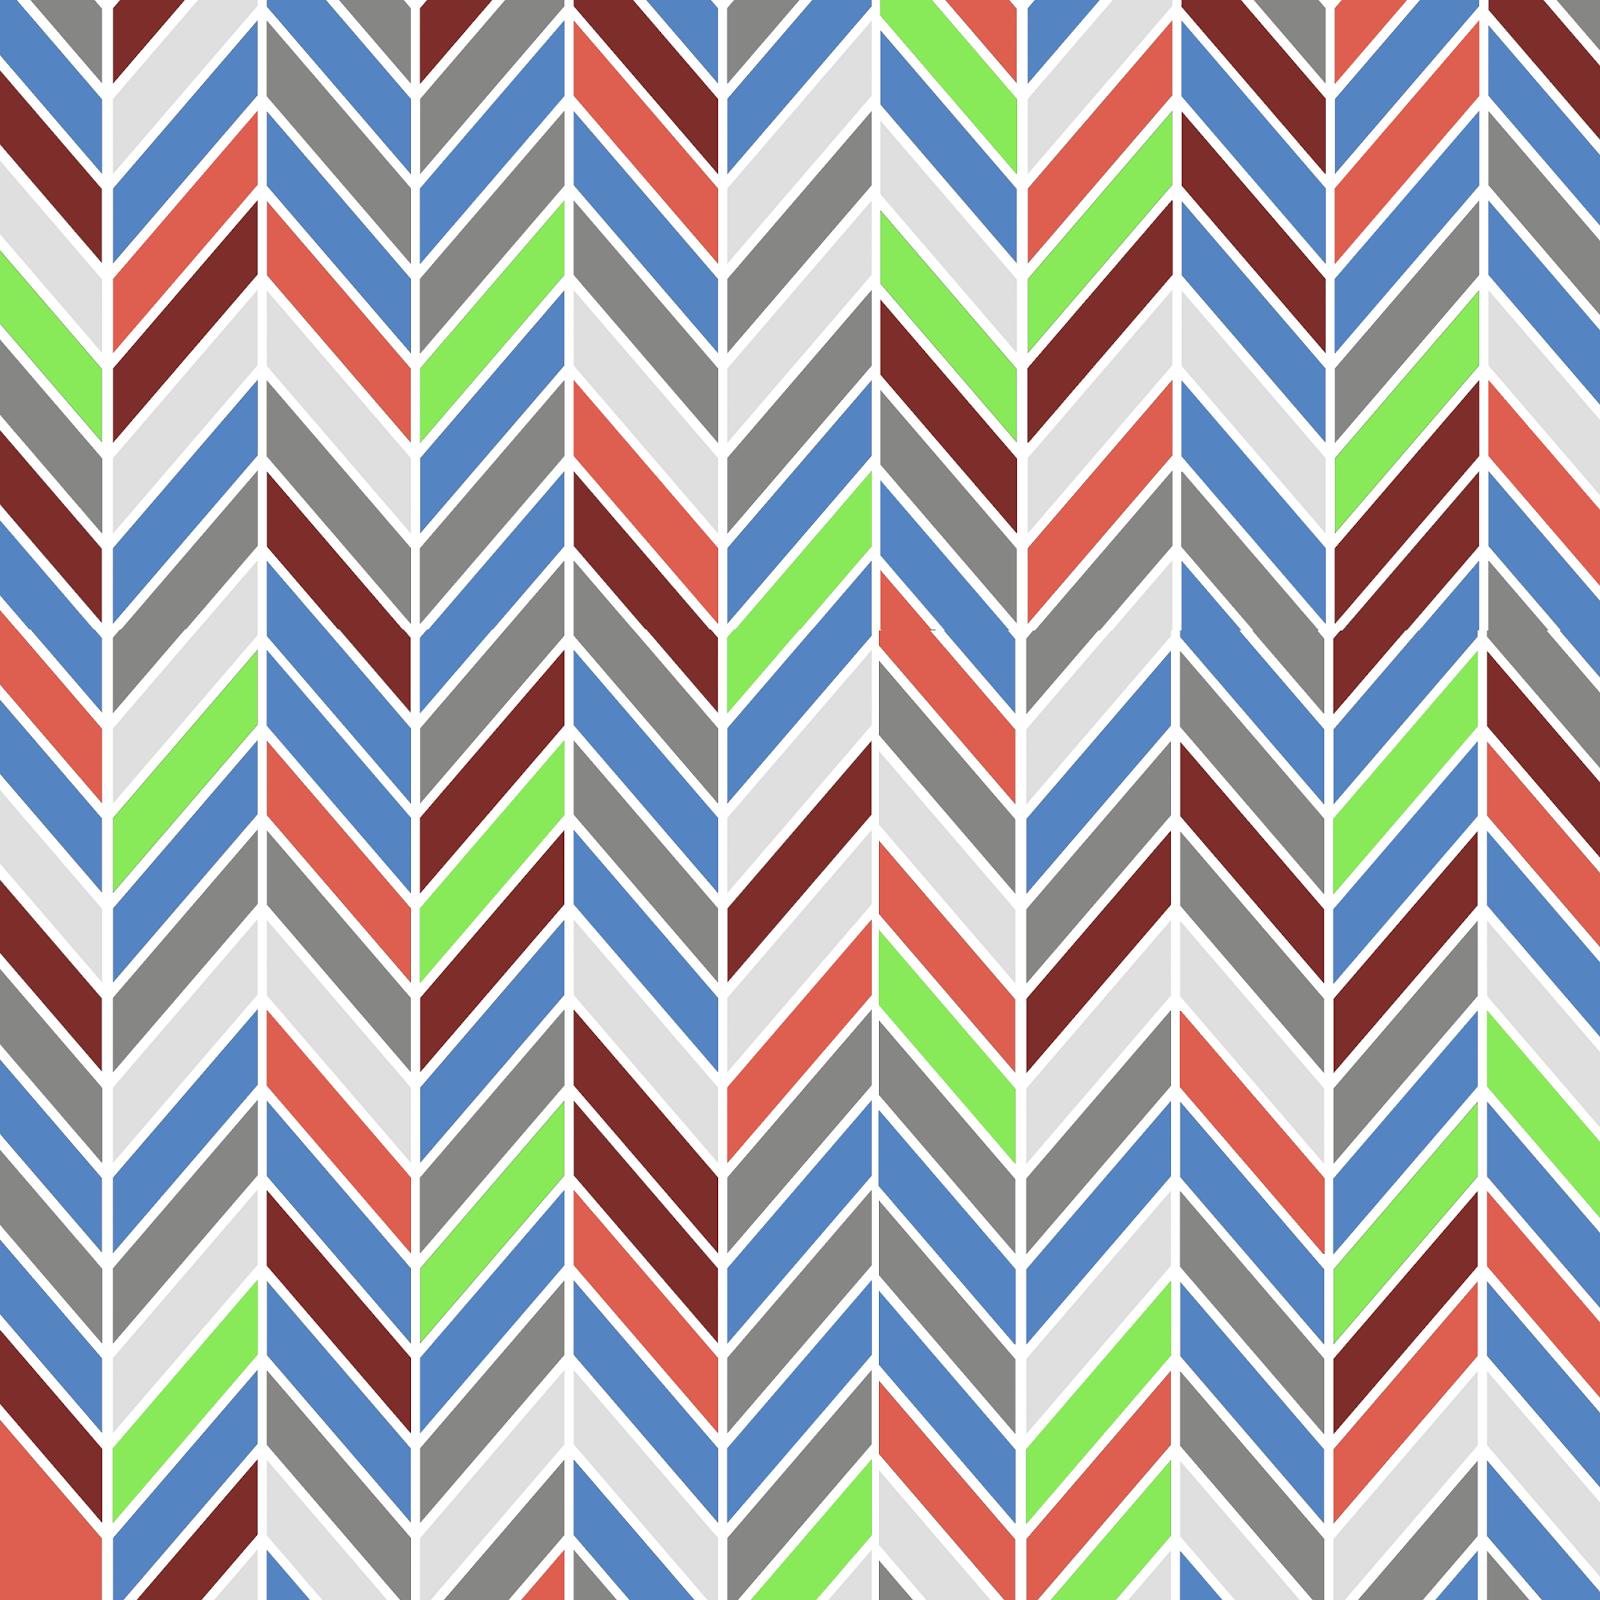 8 Colorful Chevron Background